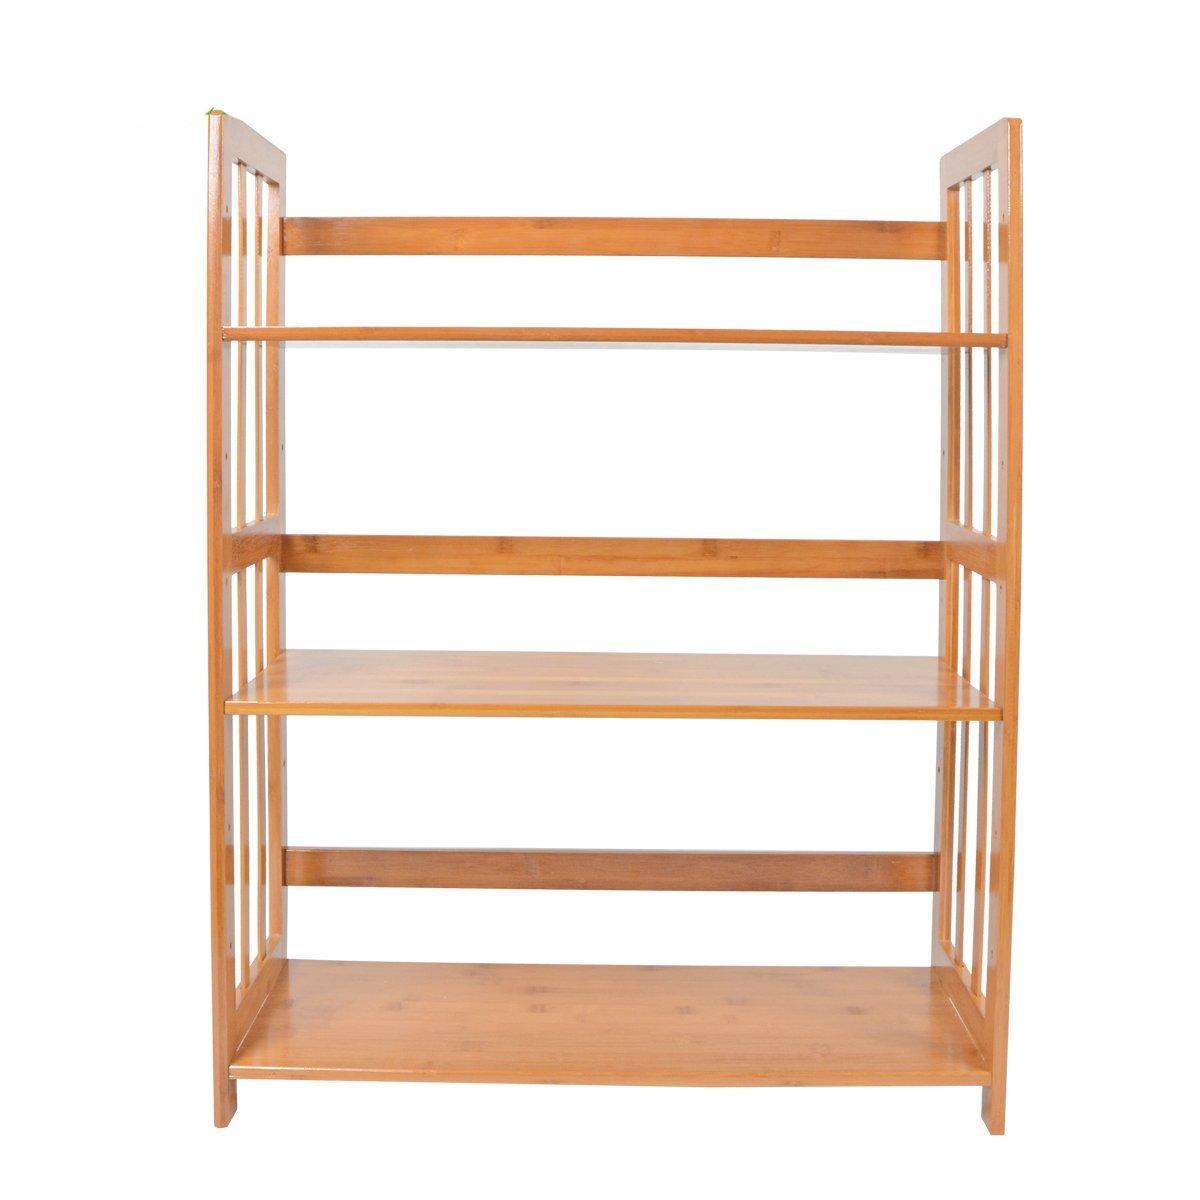 Saim Adjustable Bamboo Bookshelf Multifunctional Bathroom Kitchen Living Room Holder 3-Tier Utility Storage Rack Shelf